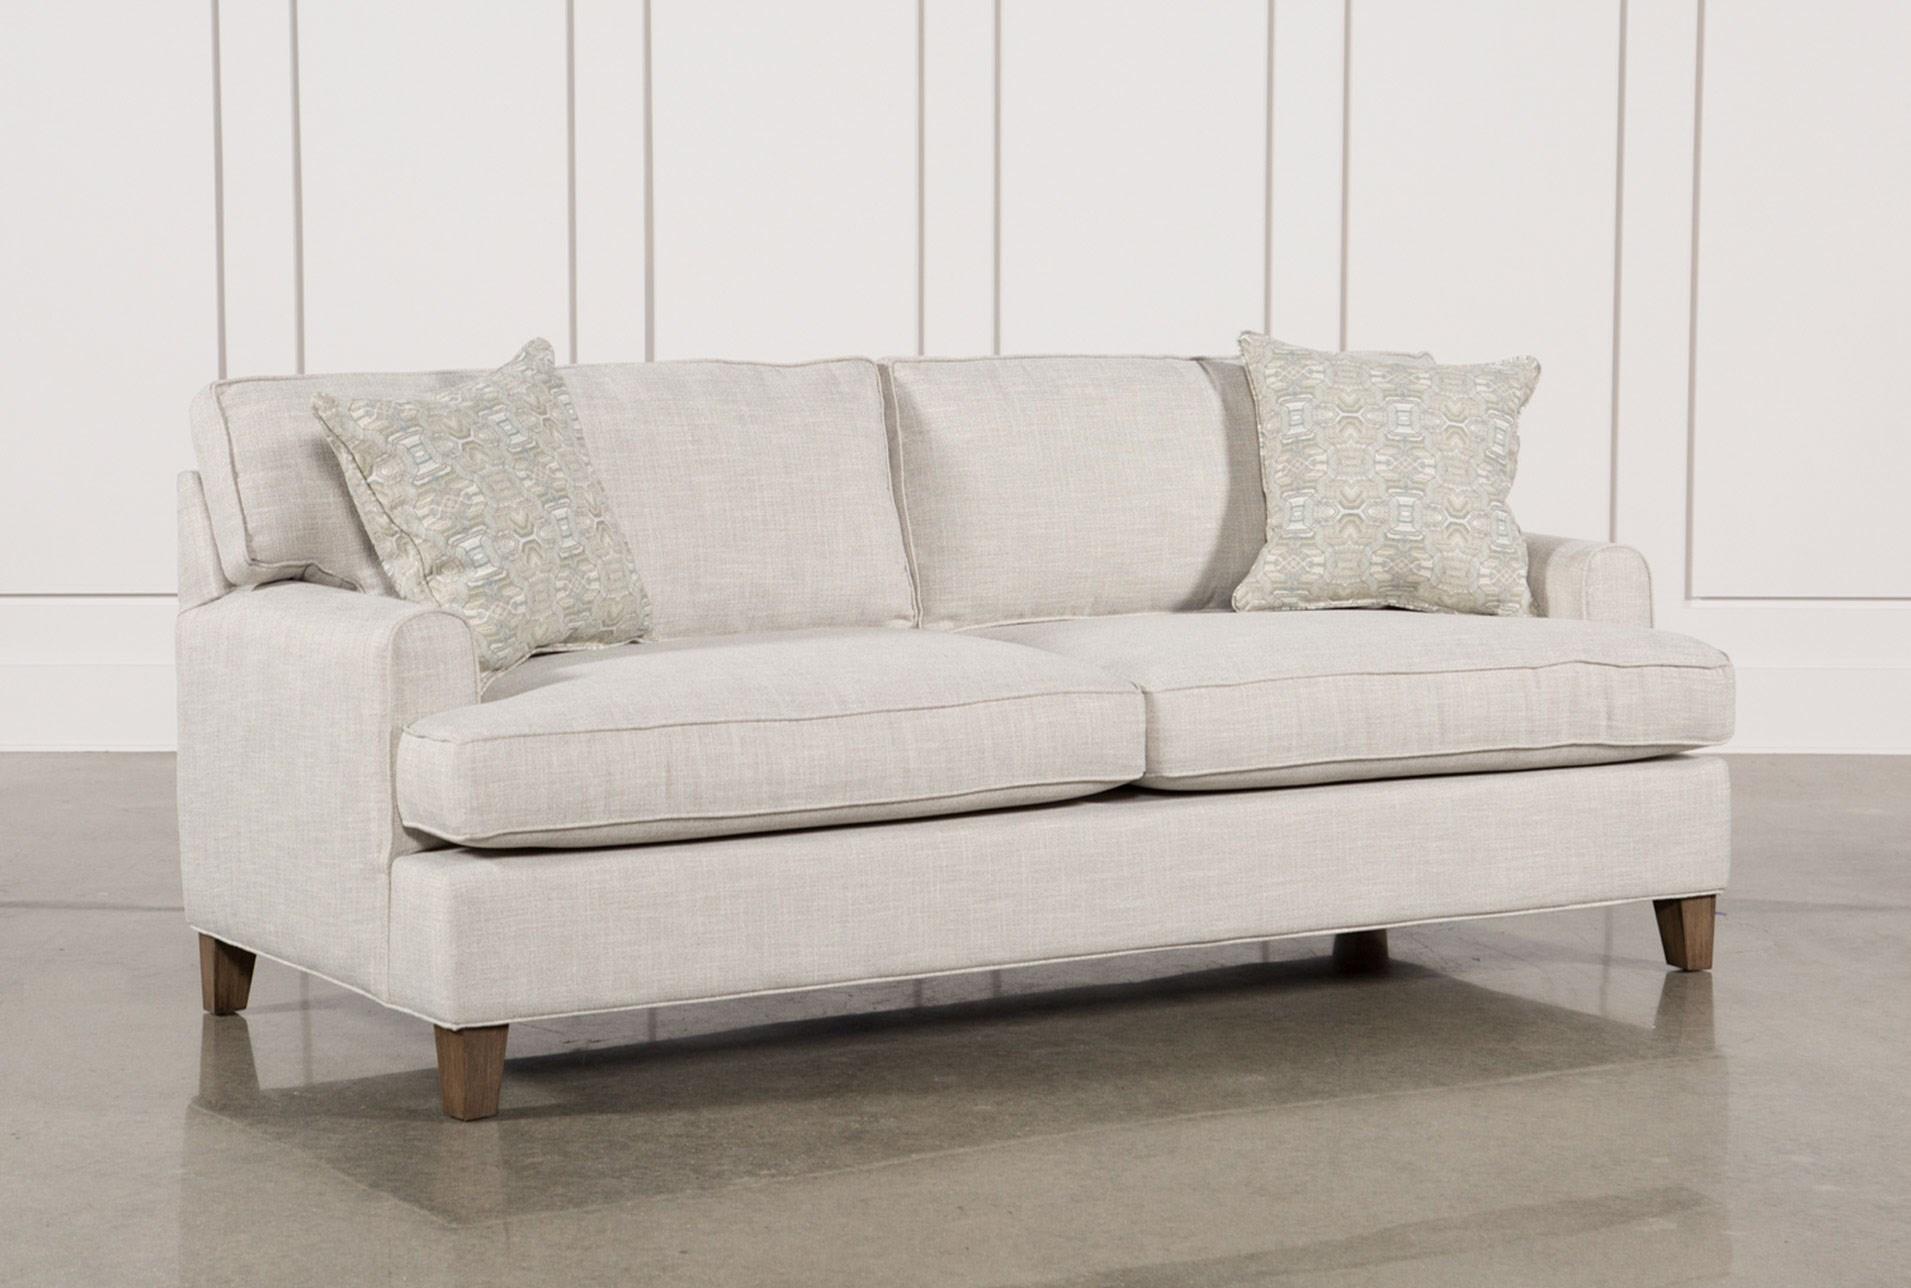 emerson sofa living spaces. Black Bedroom Furniture Sets. Home Design Ideas